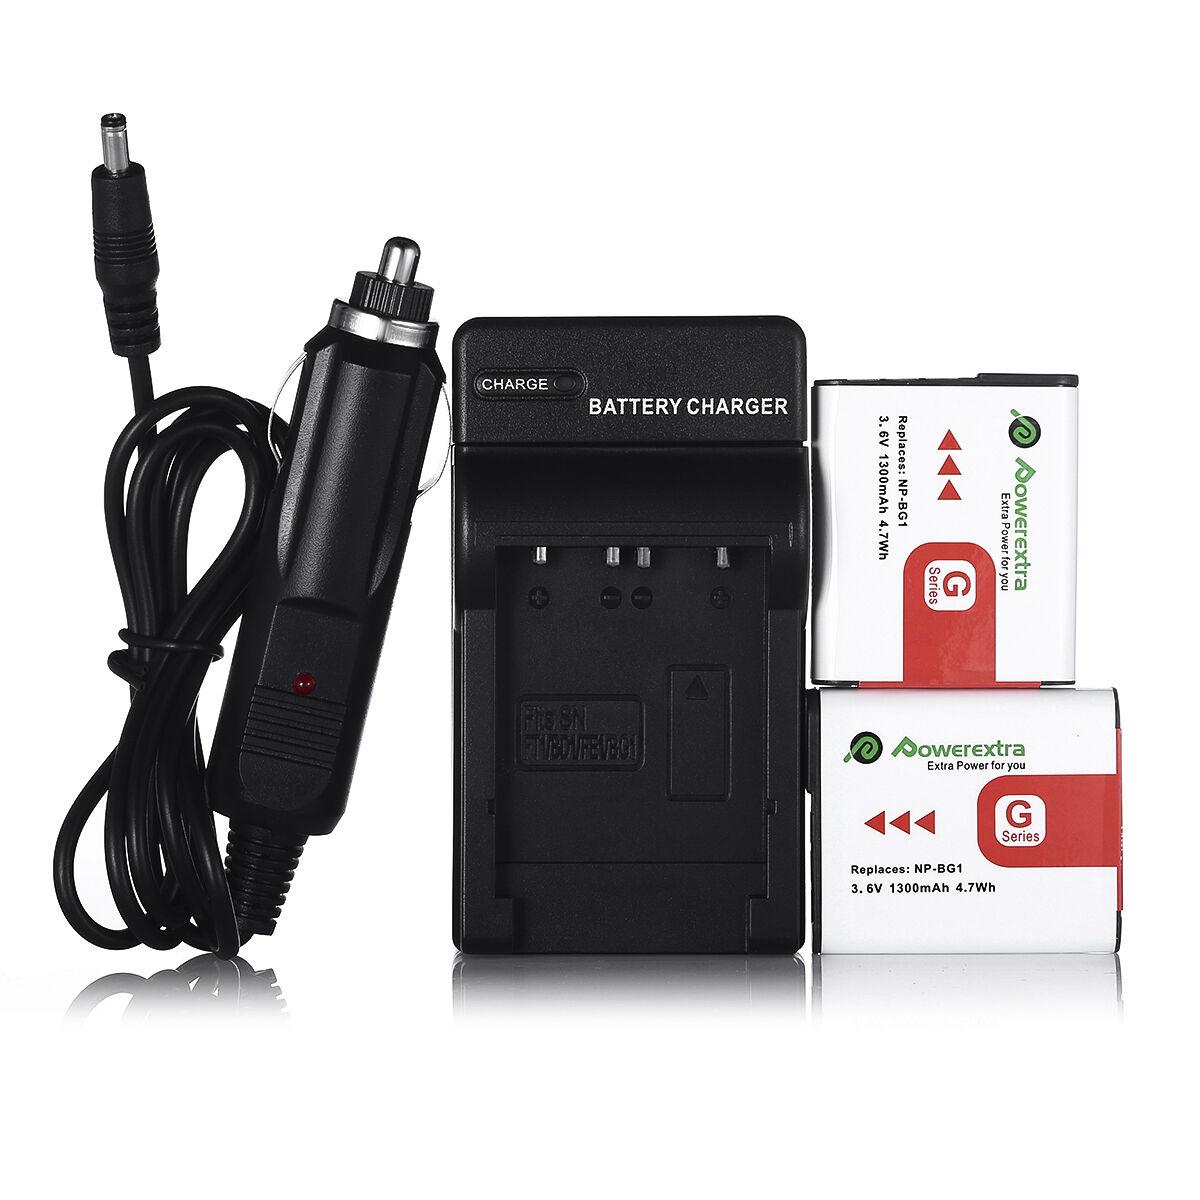 Cargador 2x Batería Para Sony NP-BG1 FG1 DSC-H10 H20 H3 H50 H55 H7 H9 HX5 HX5V